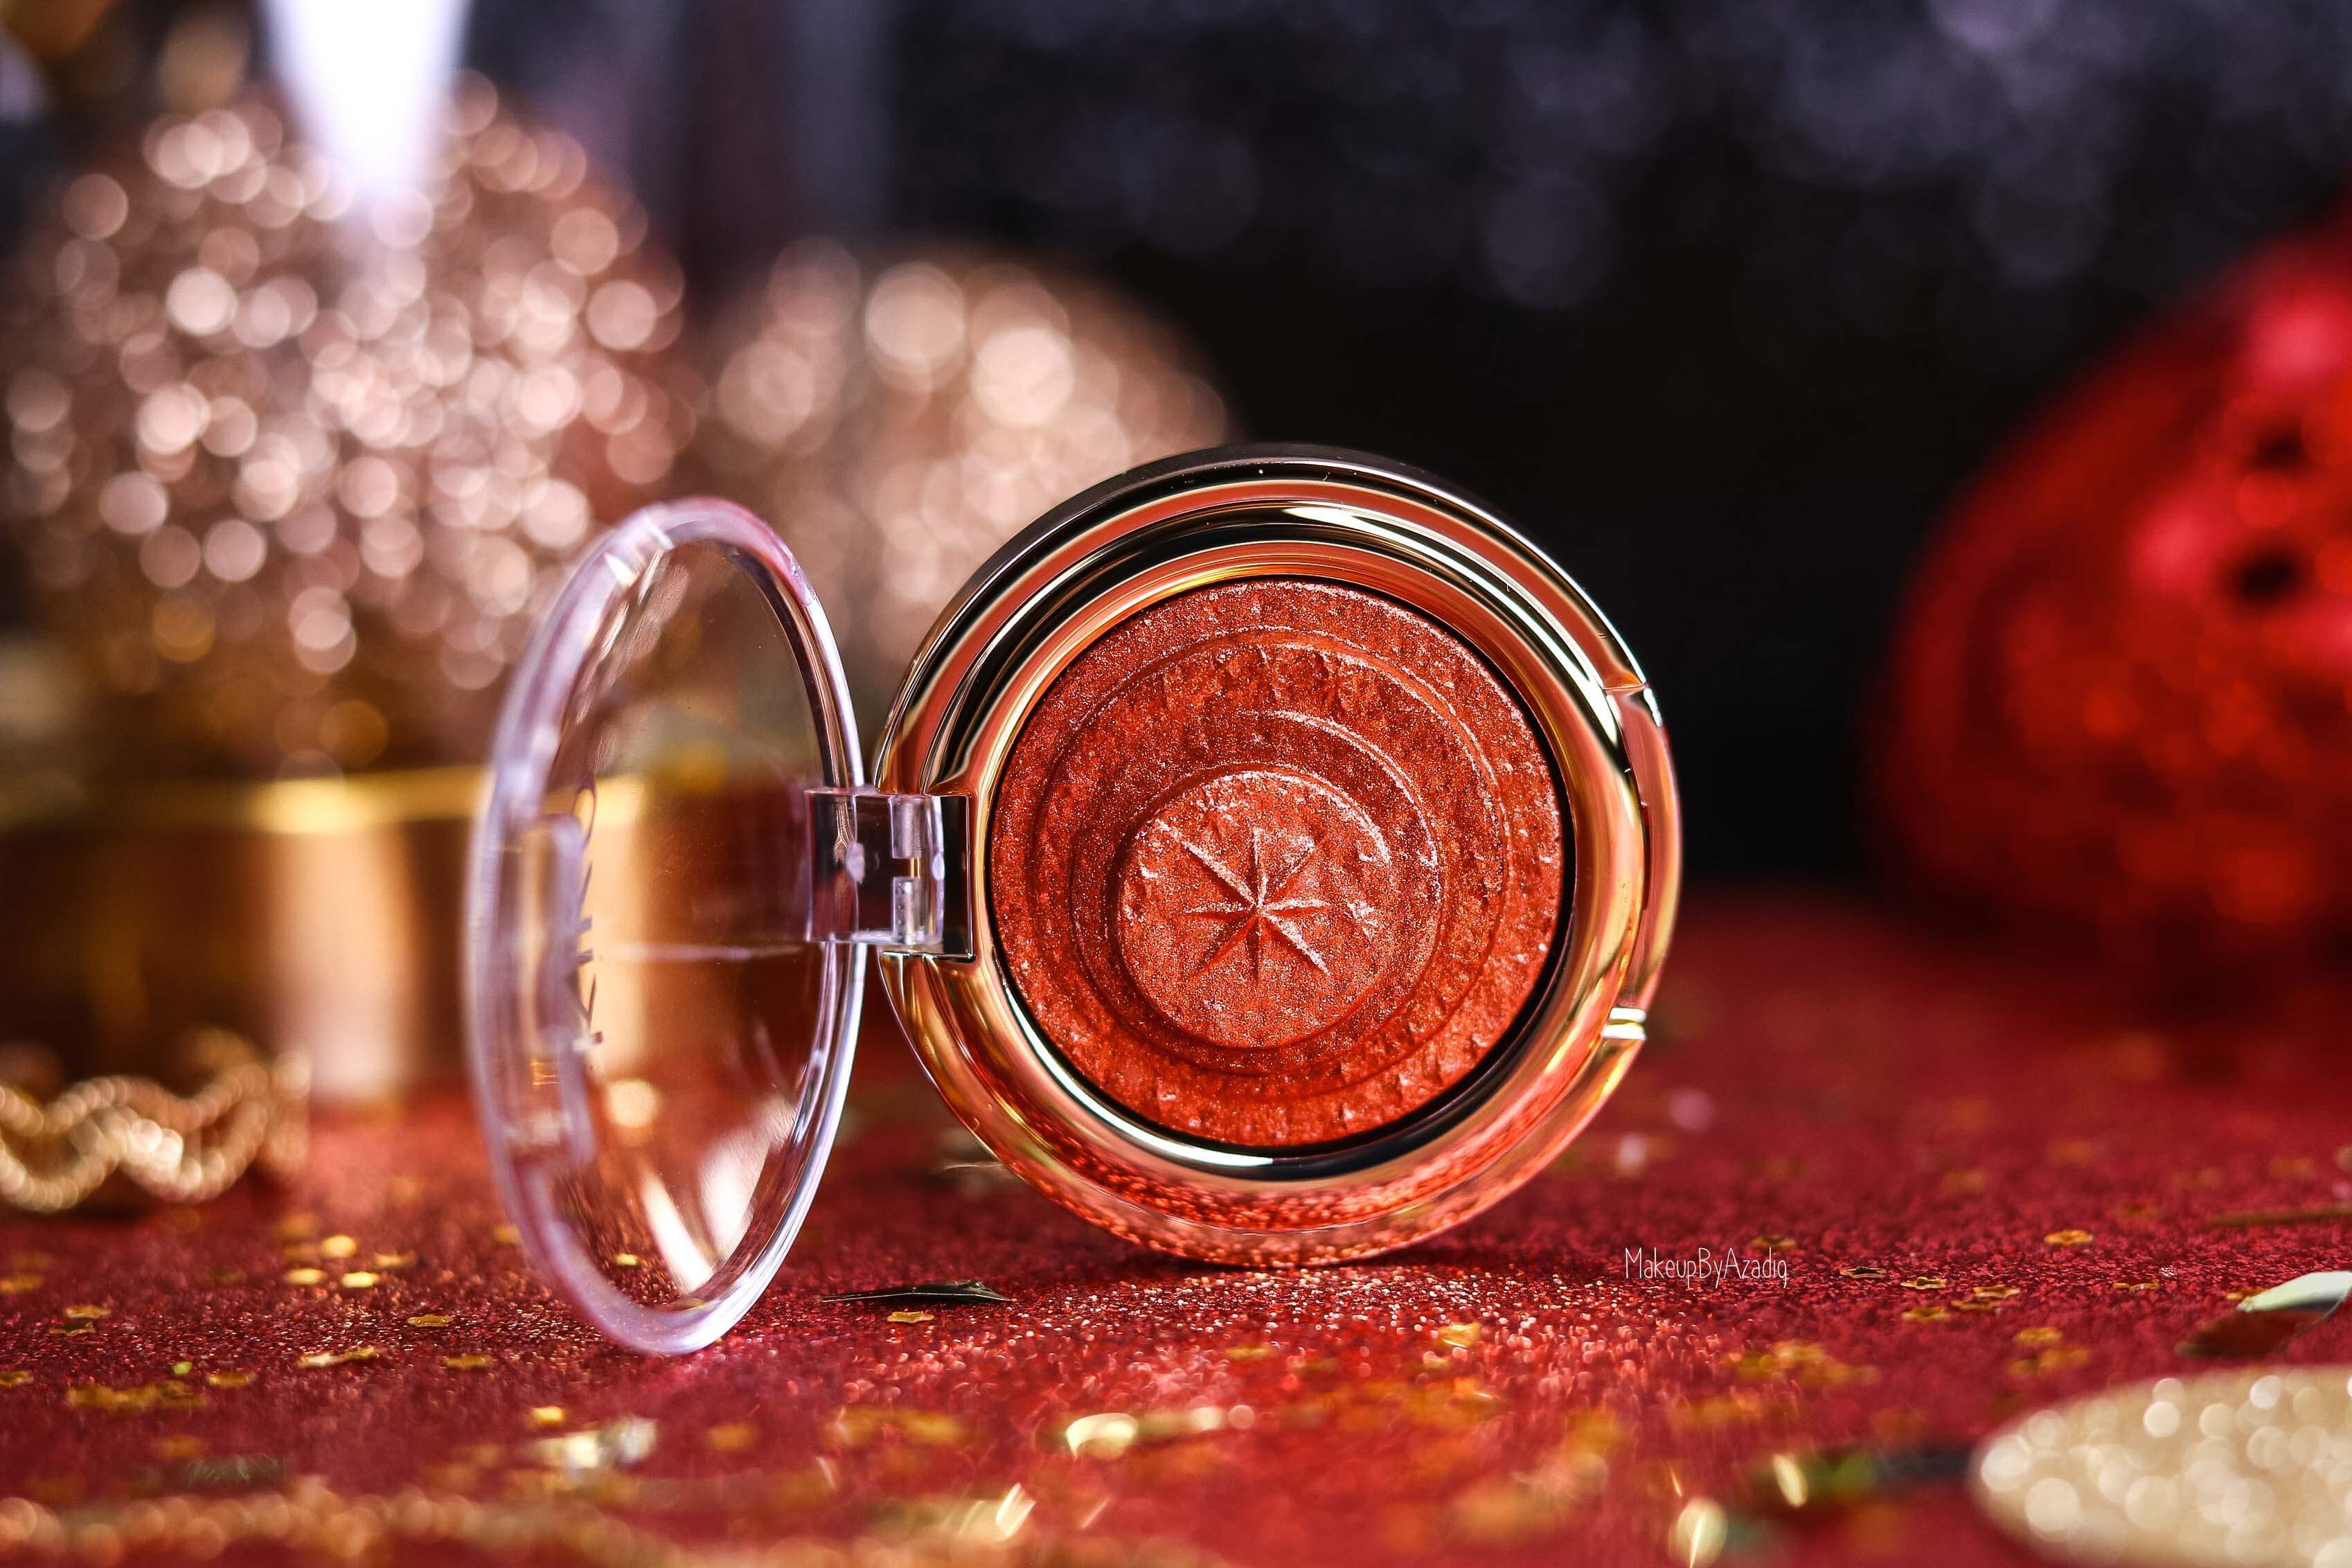 revue-collection-noel-kiko-milano-troyes-magical-holiday-rouge-levres-fard-paupieres-makeupbyazadig-avis-prix-swatch-paillete-2019-cuivre